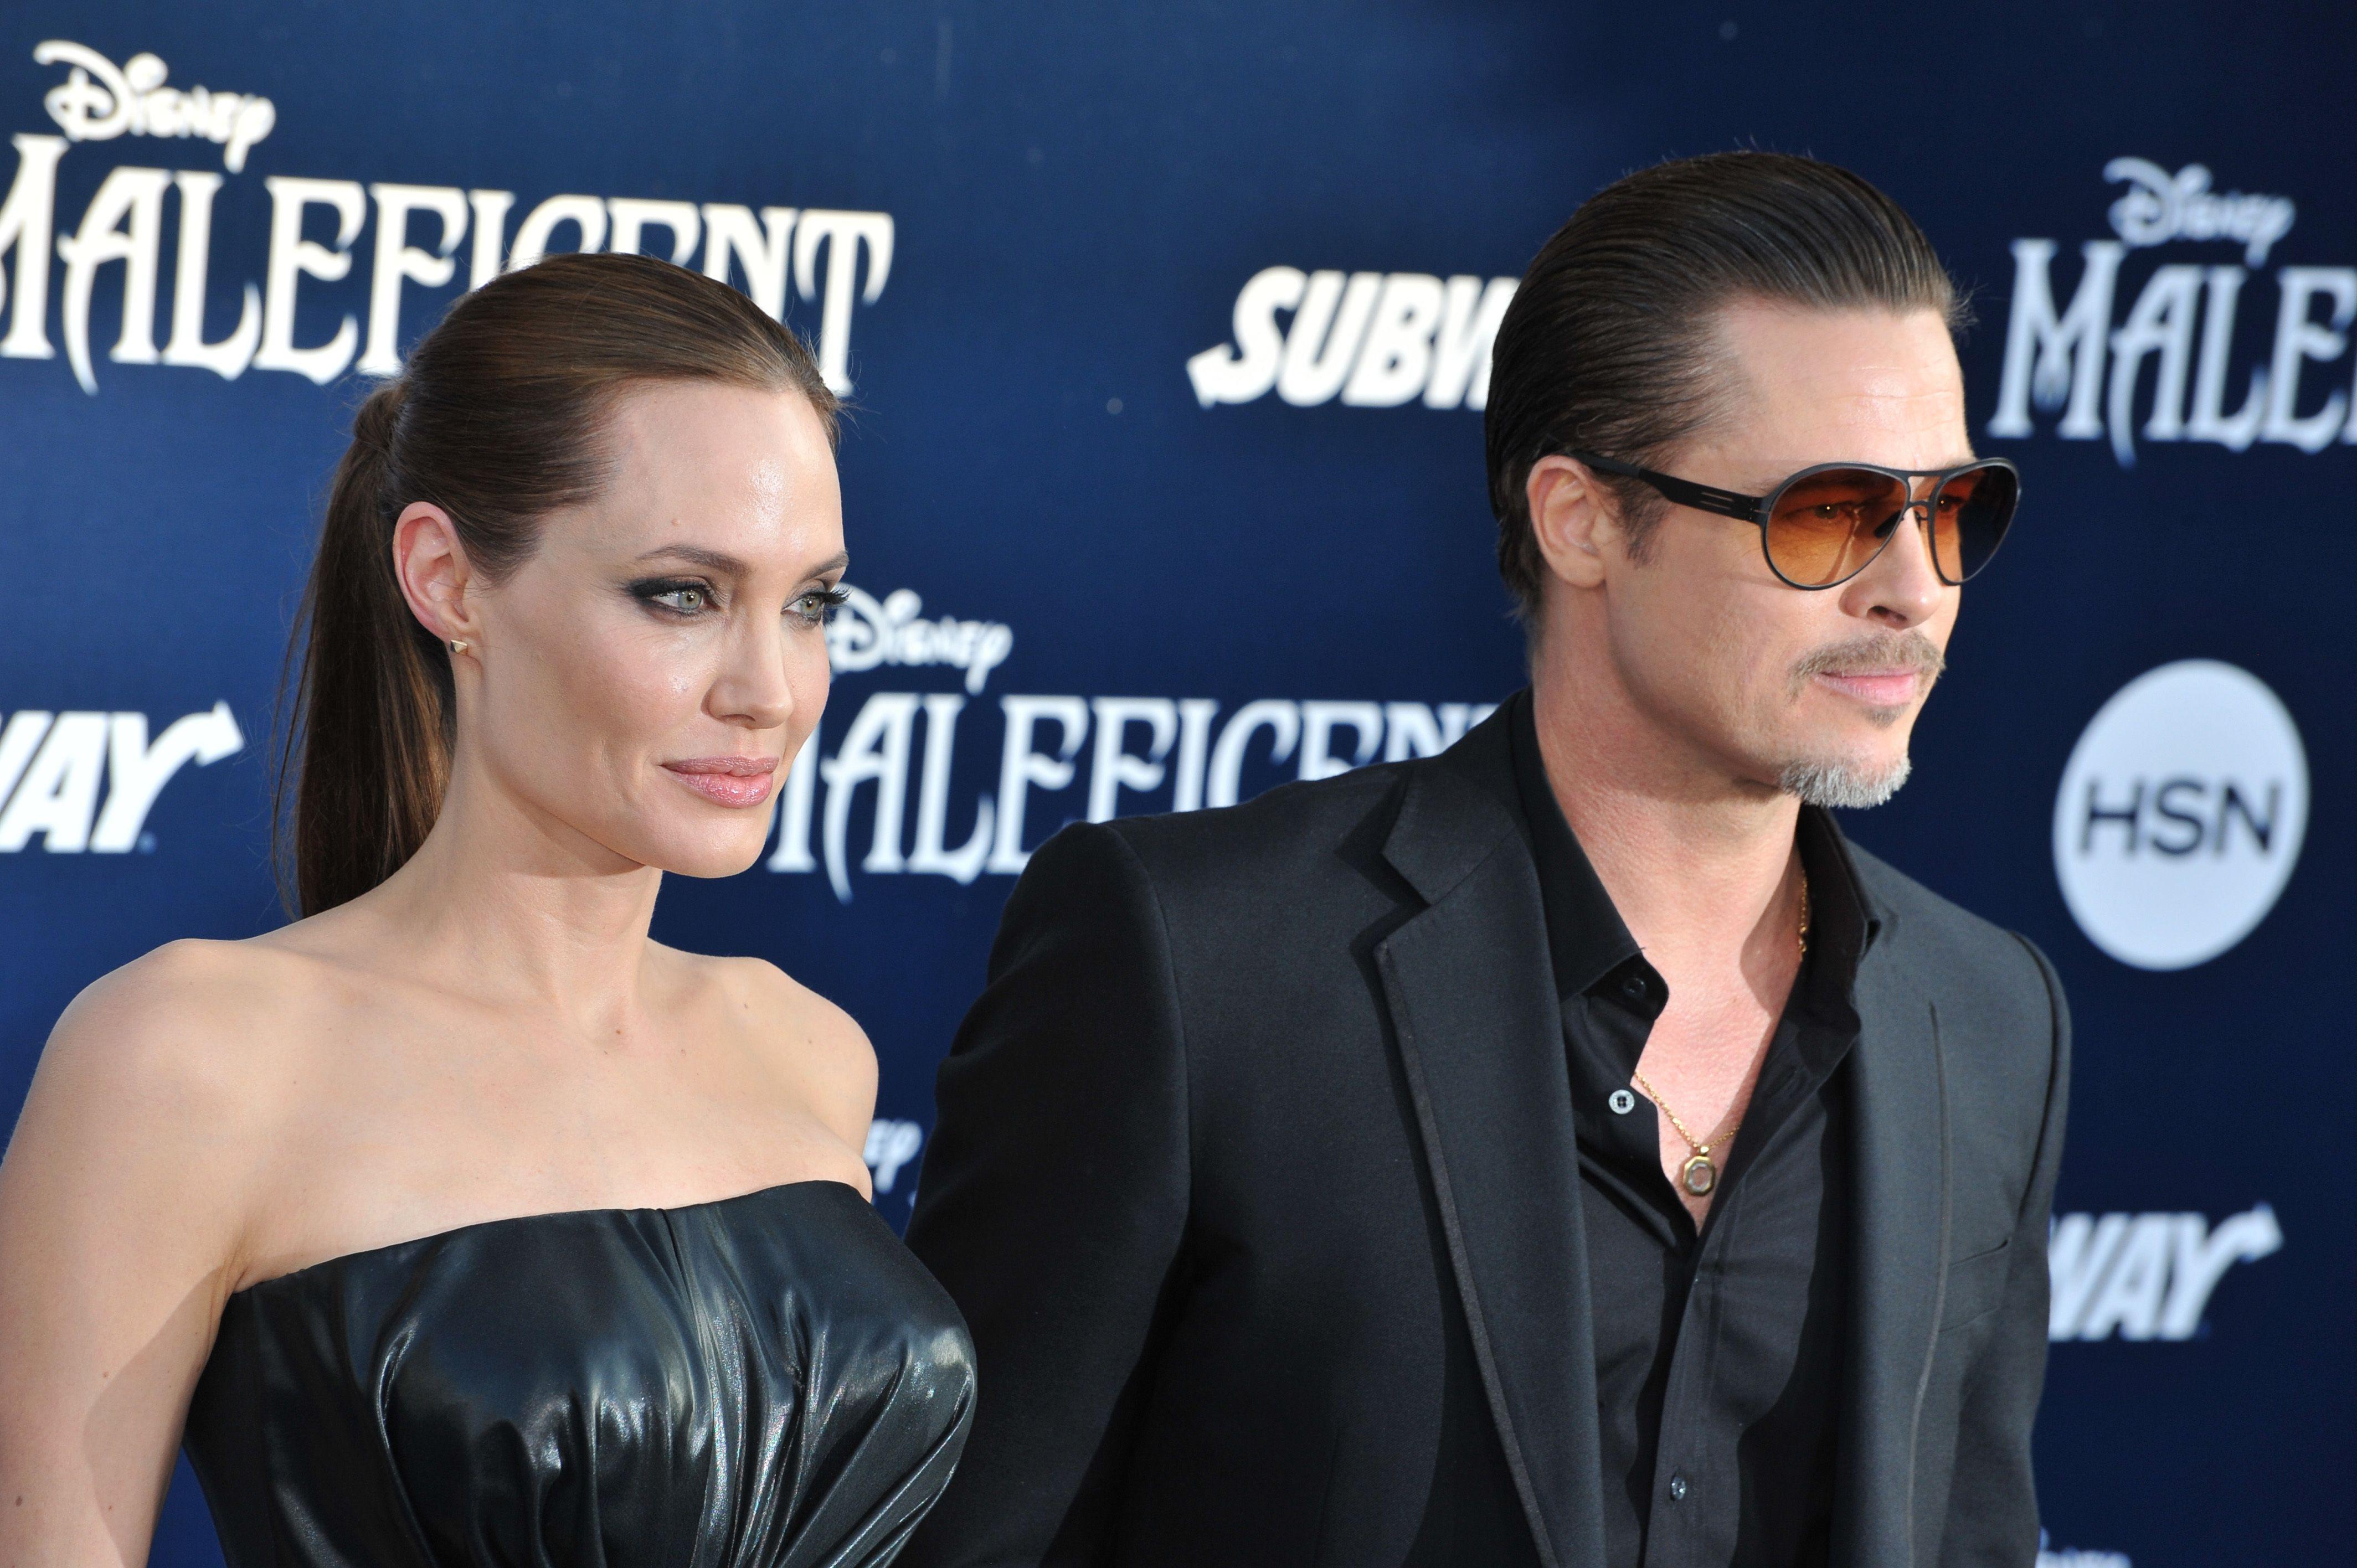 3. Brad Pitt & Angelina Jolie